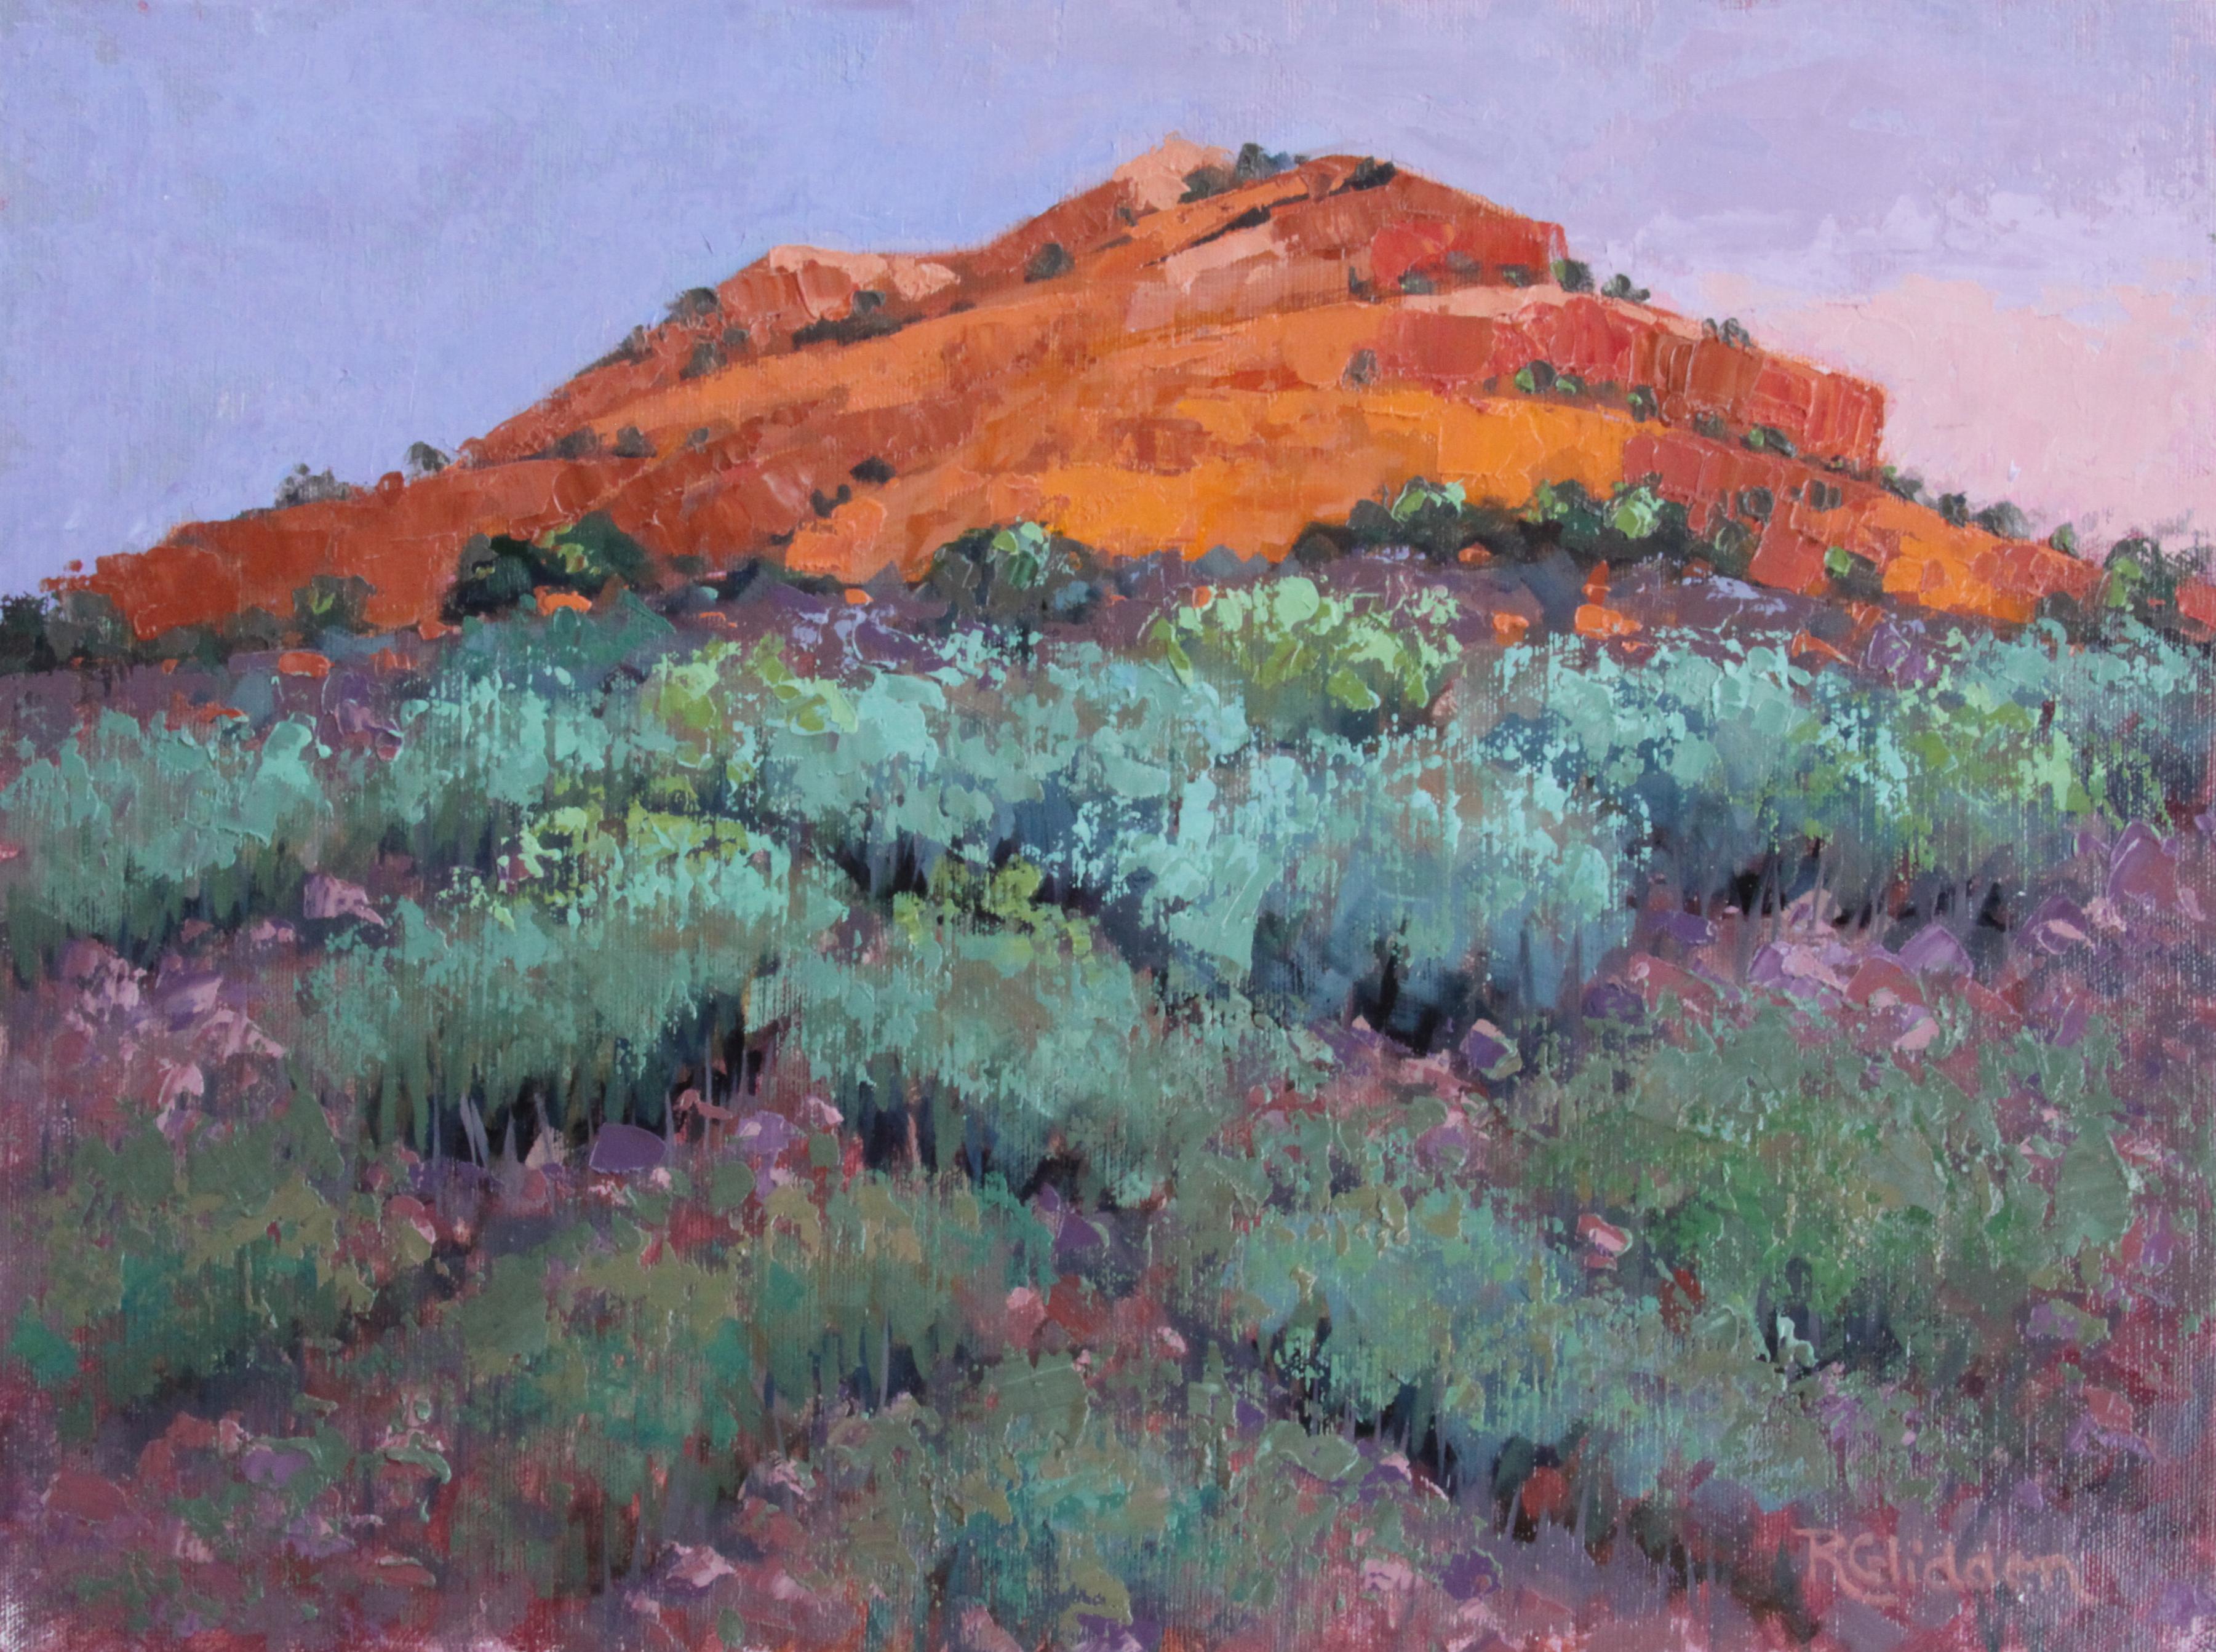 The works of Roberta Glidden